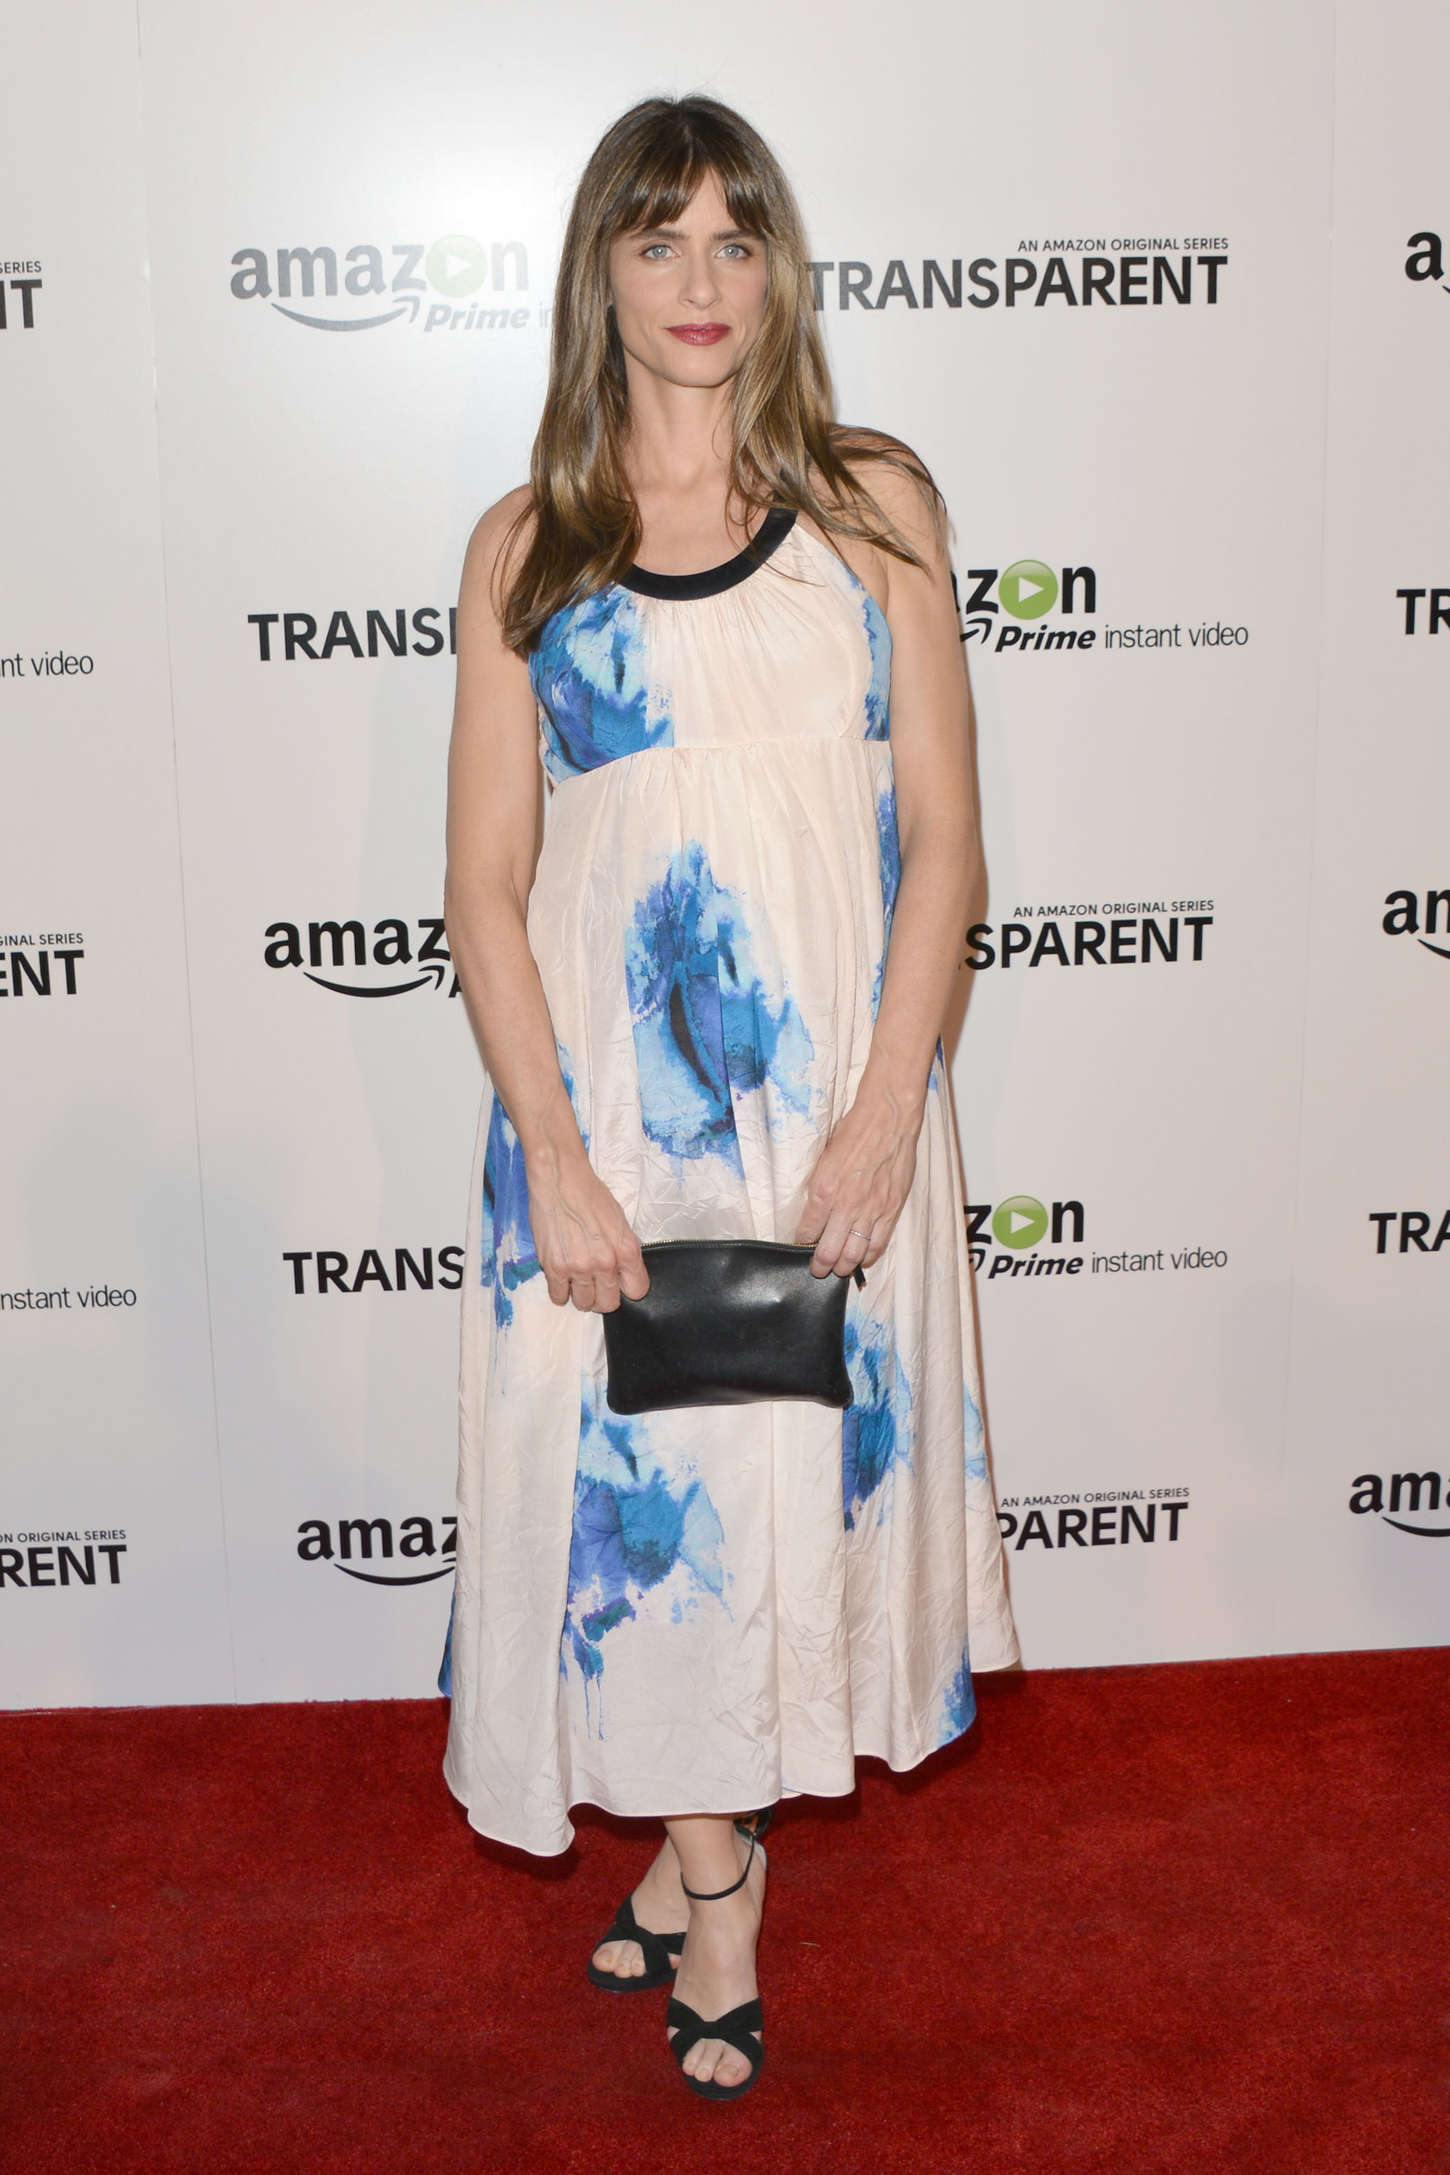 Amanda Peet Transparent Premiere in Los Angeles